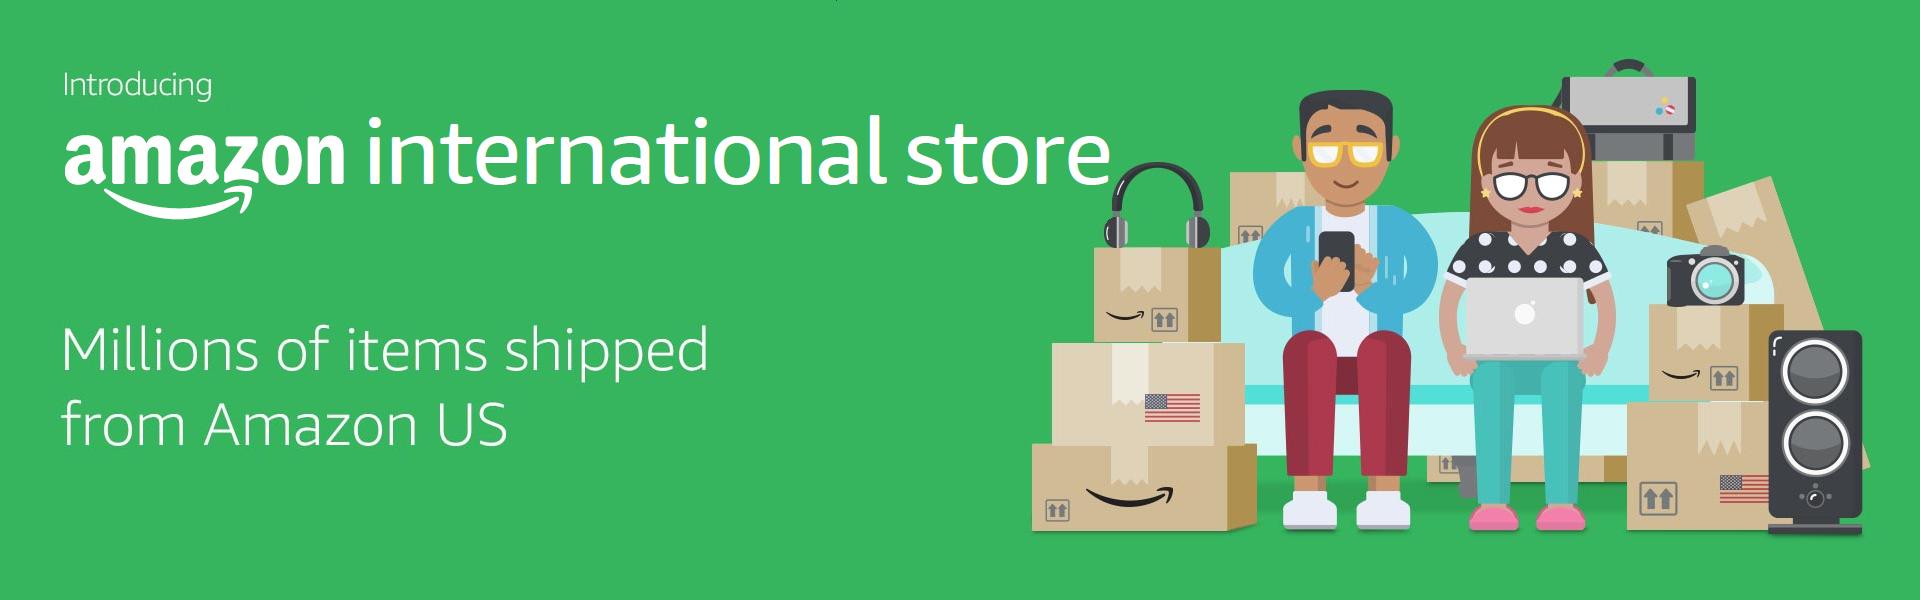 Amazon international store us products